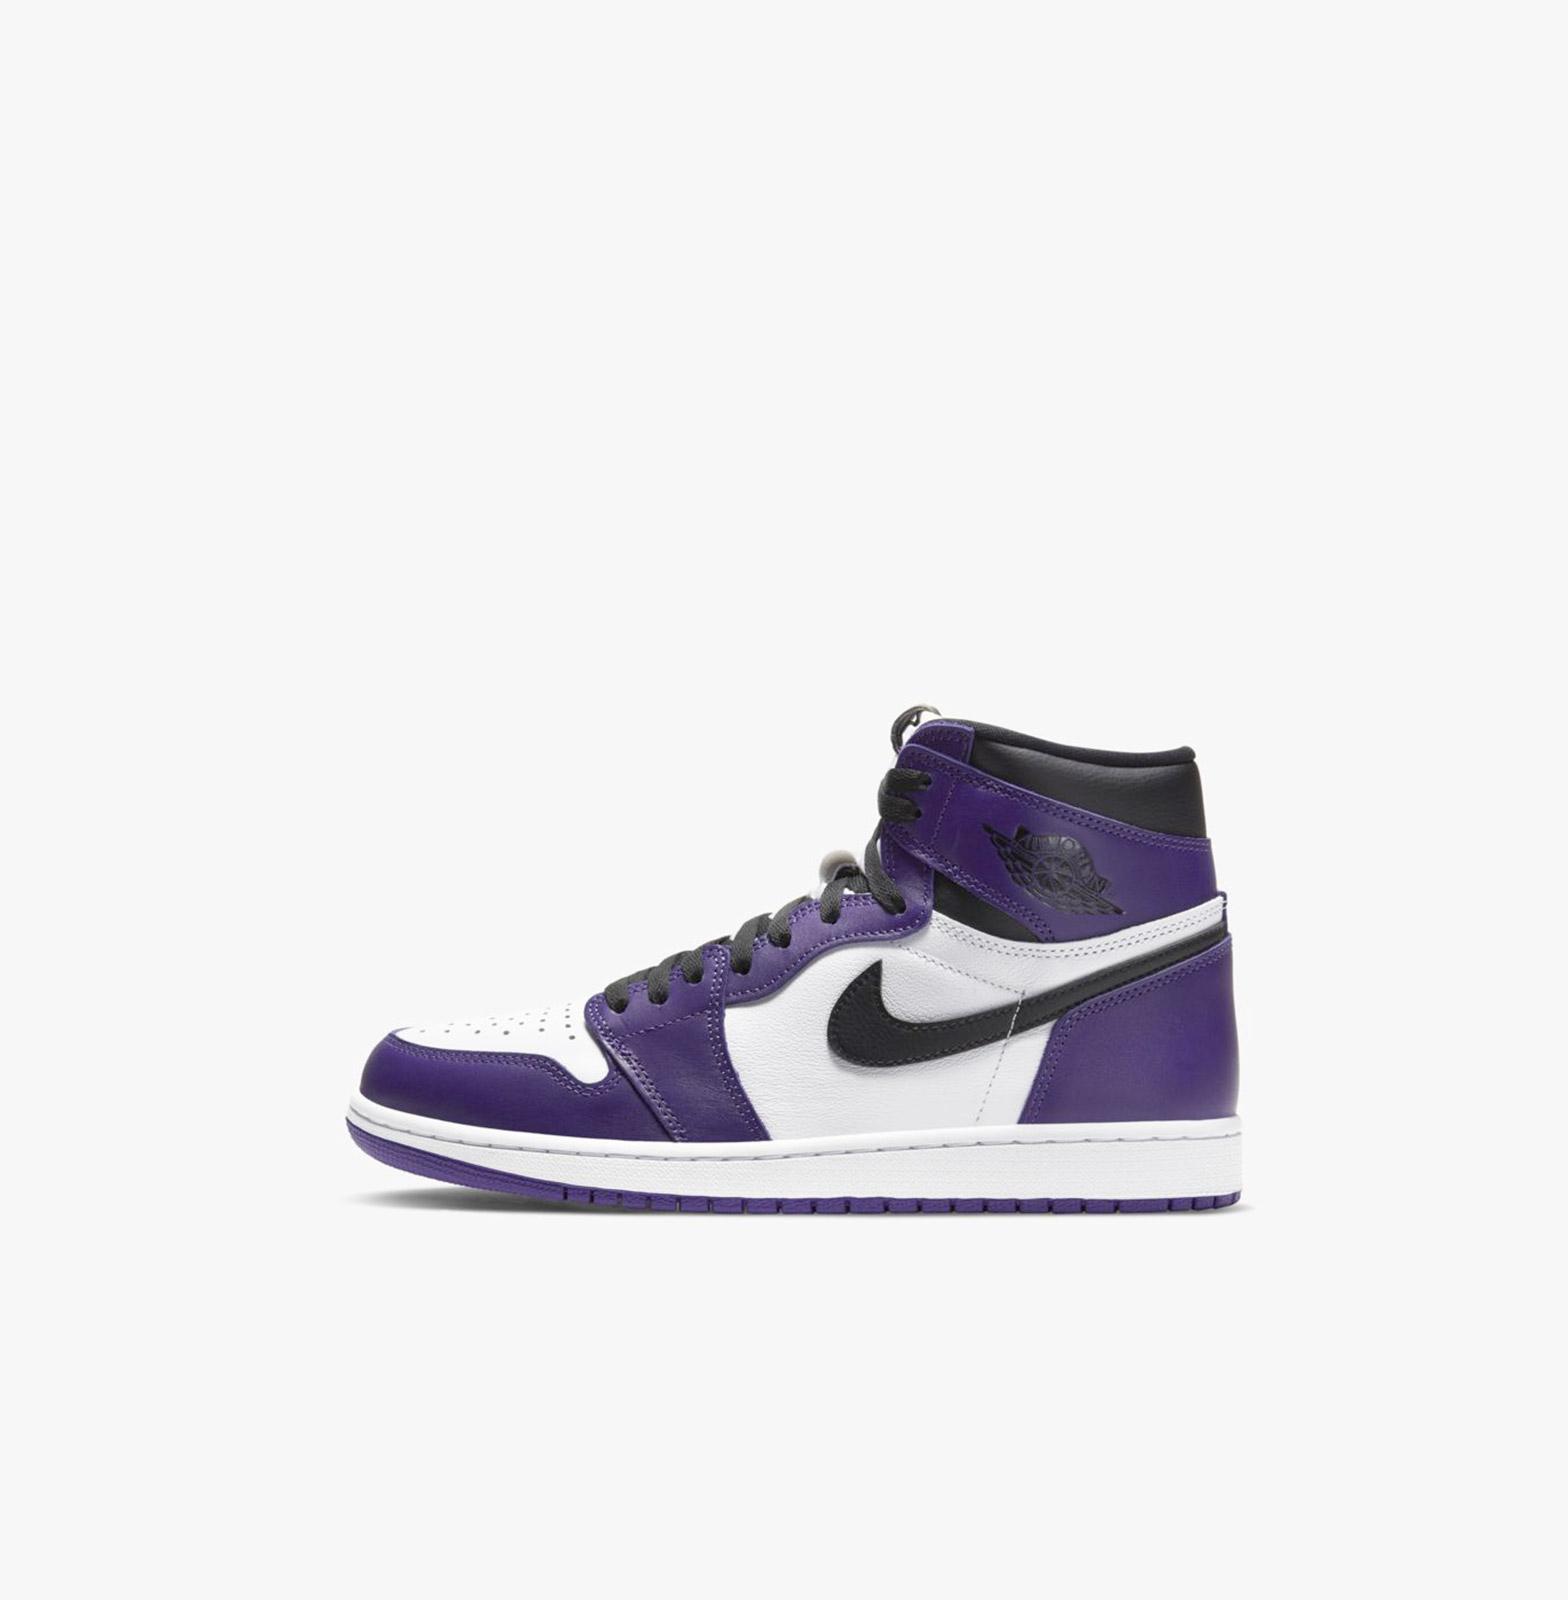 Air Jordan 1 Retro High OG Court Purple - Nike   L'Original Namur ...